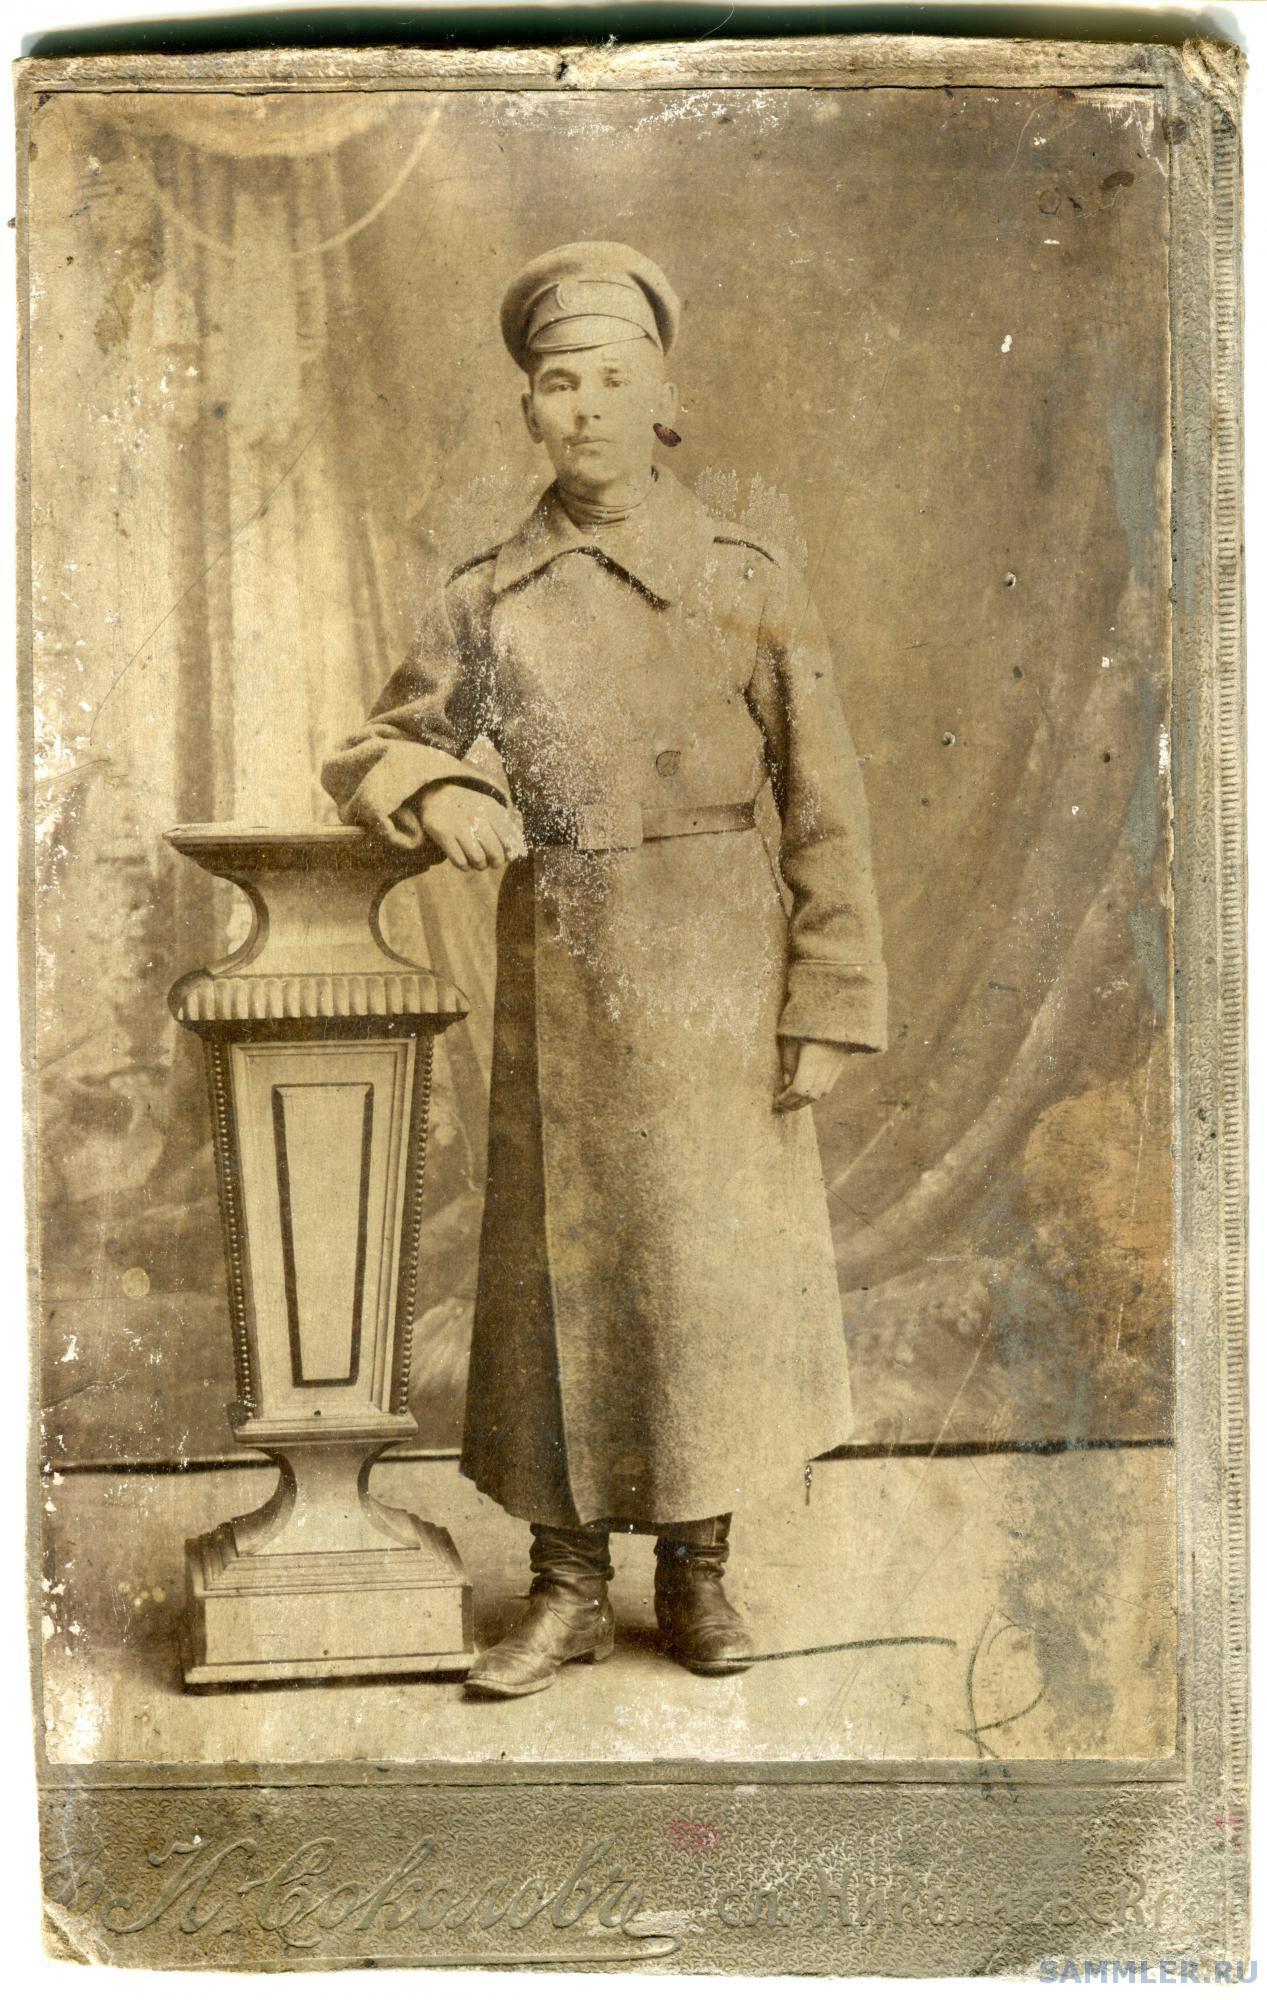 Неизвестный солдат 243 полка.jpg